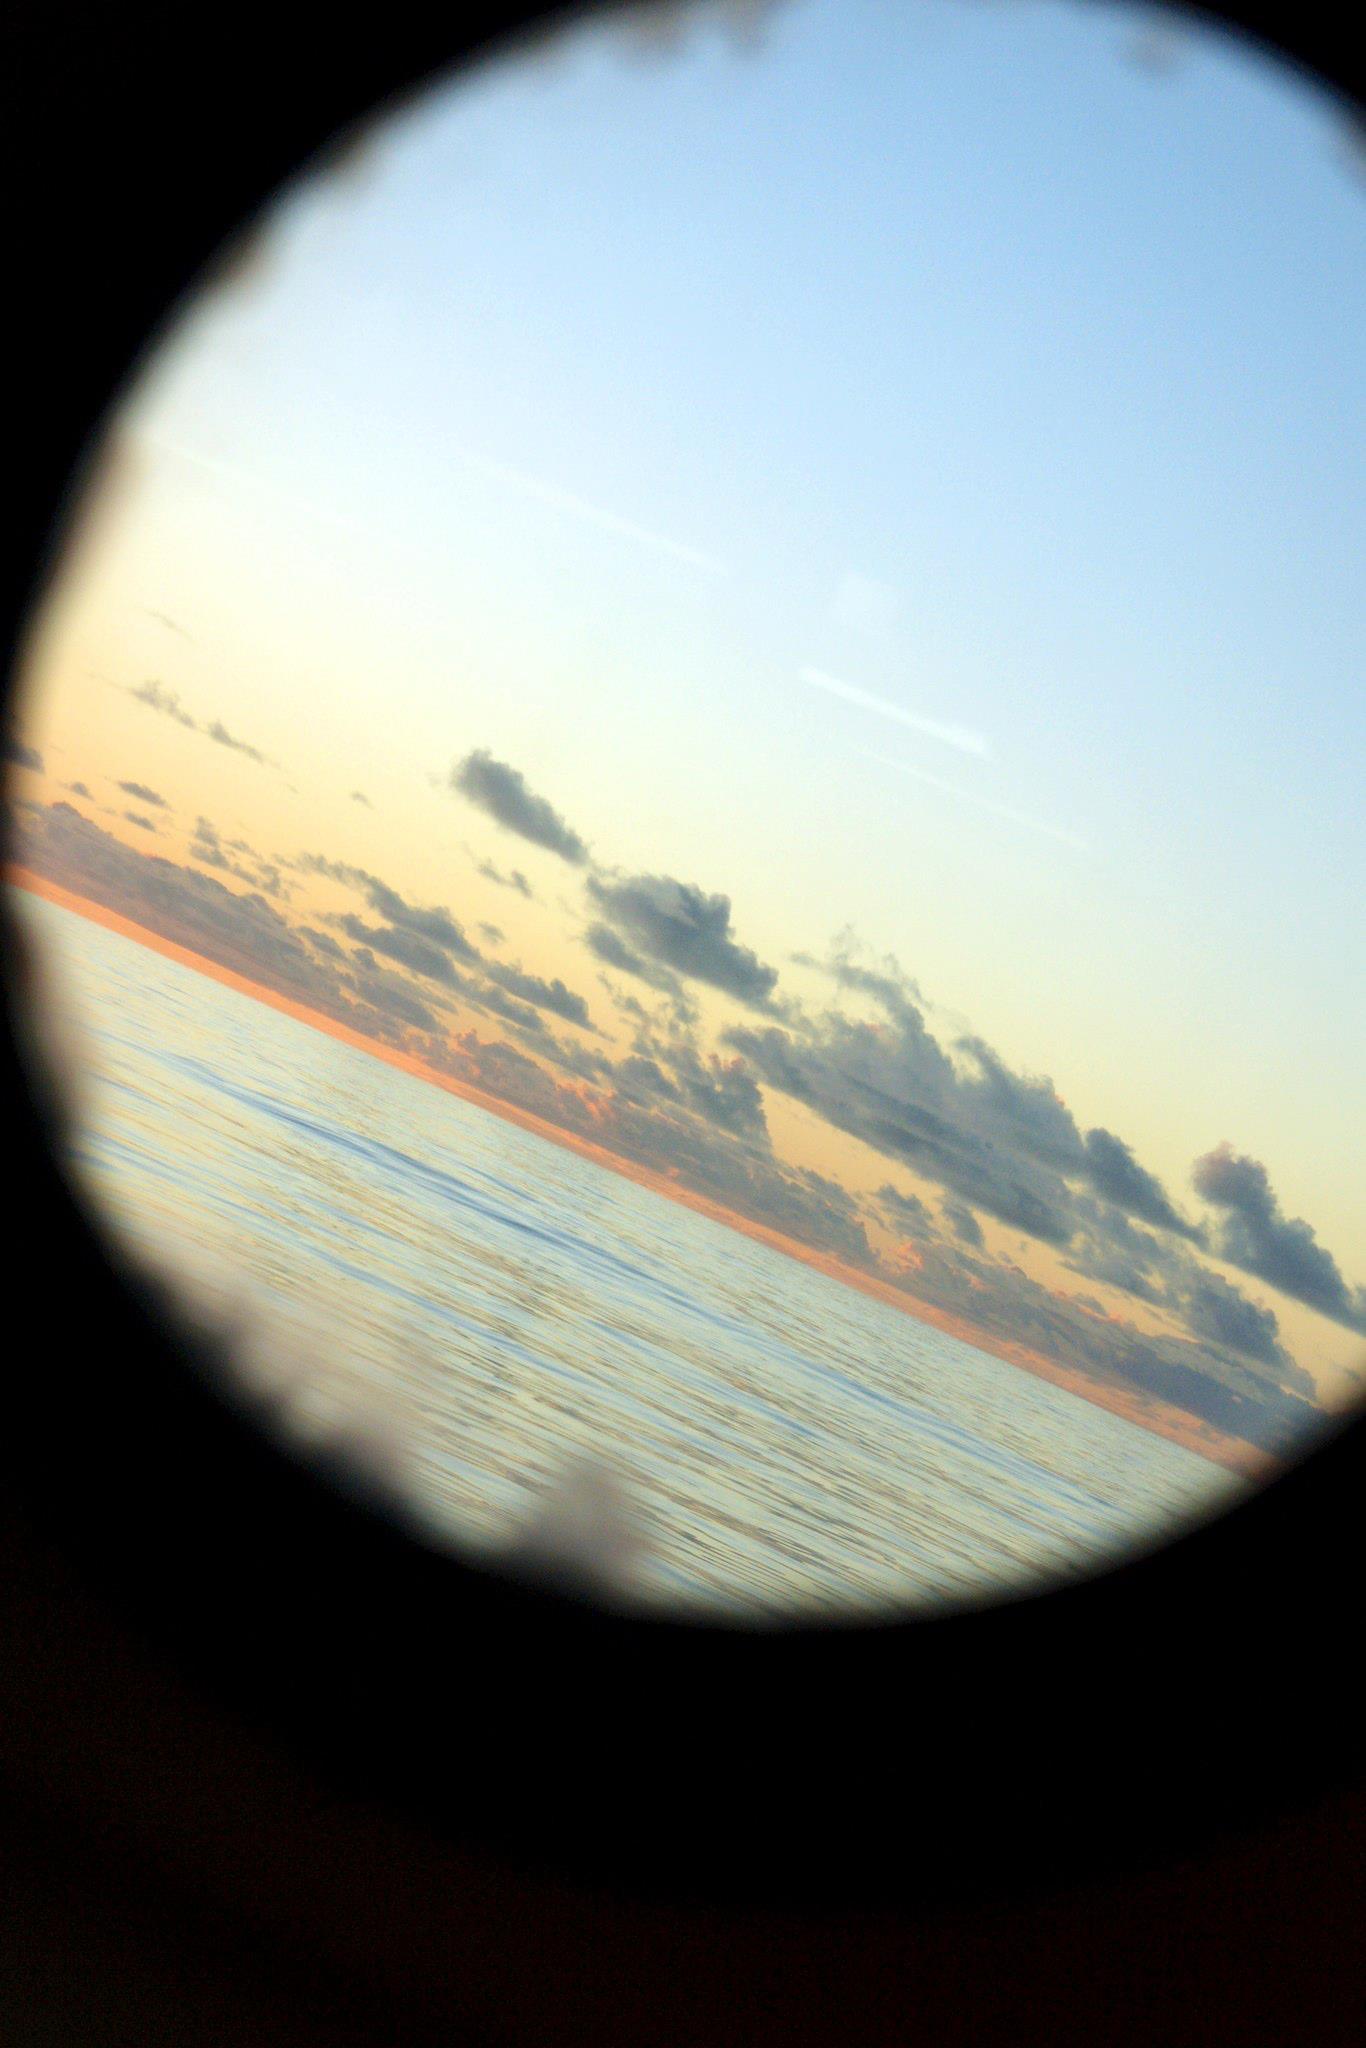 Sunset, NPSG, R/V Kilo Moana, 2011